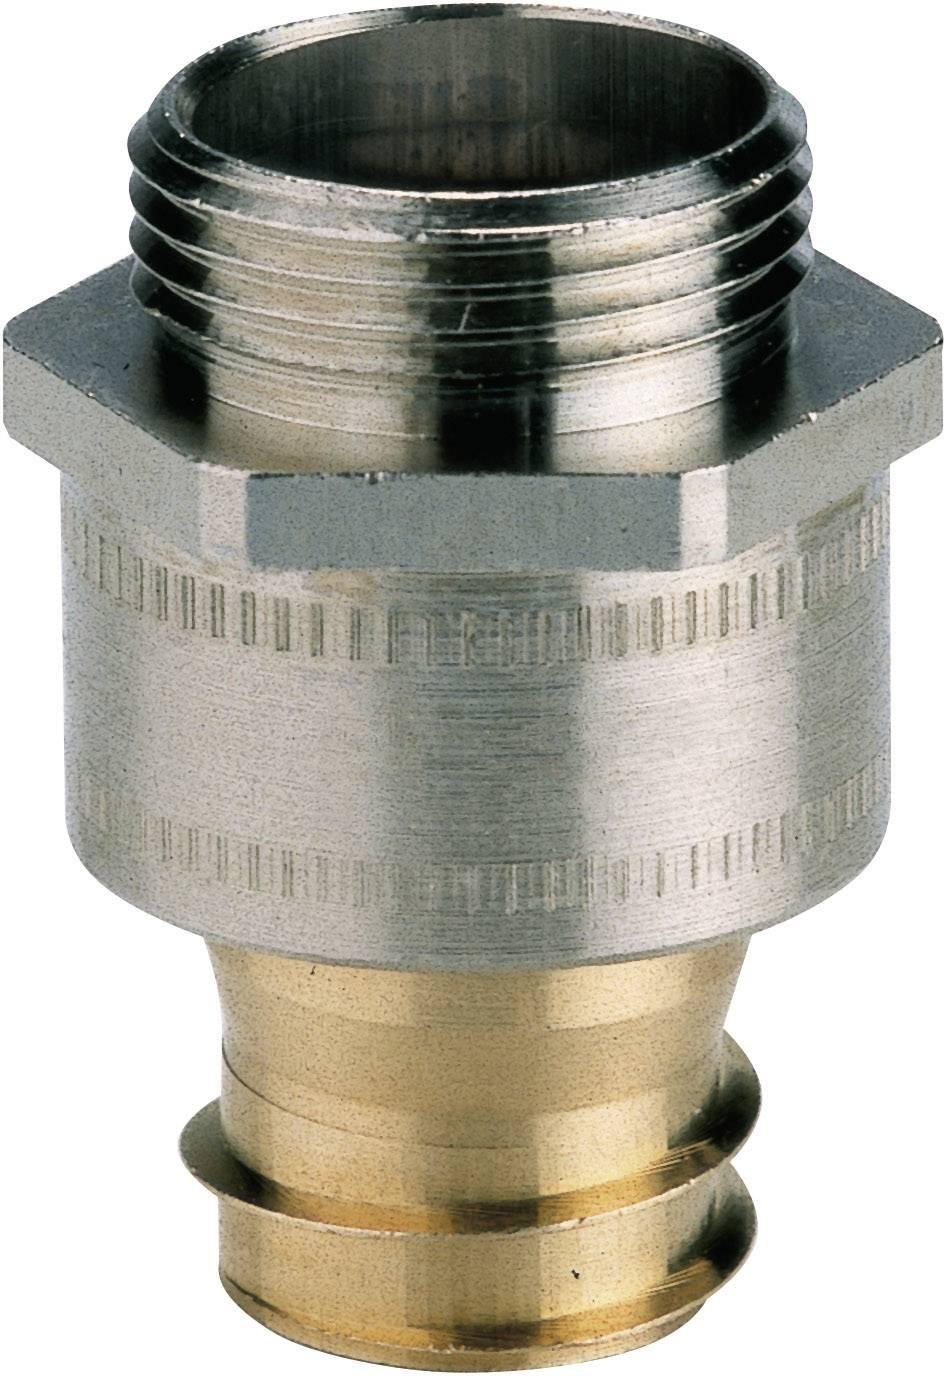 Hadicová spojka rovná LappKabel SILVYN® LI-M 12x1,5 SGY 61802370, M12, stříbrná, 1 ks